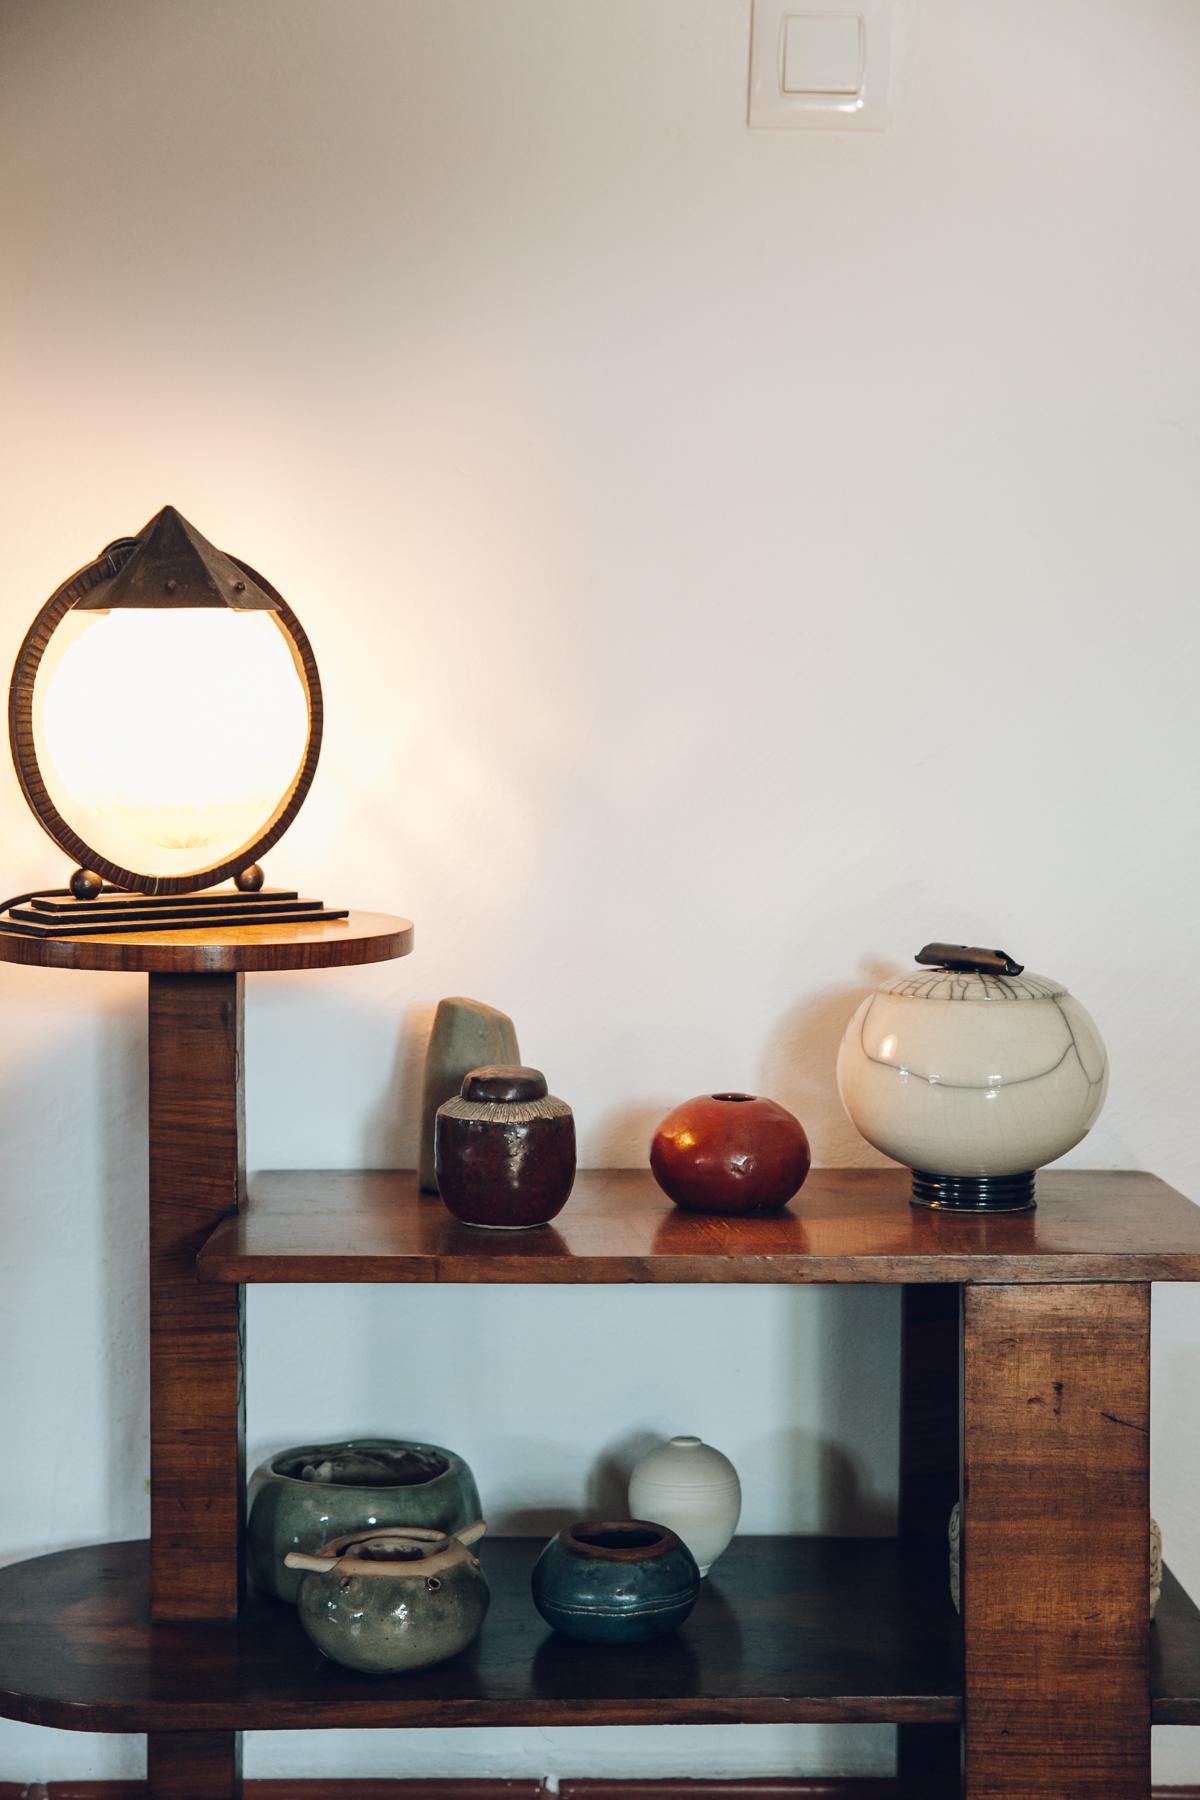 Ceramic display in our Spanish casa.